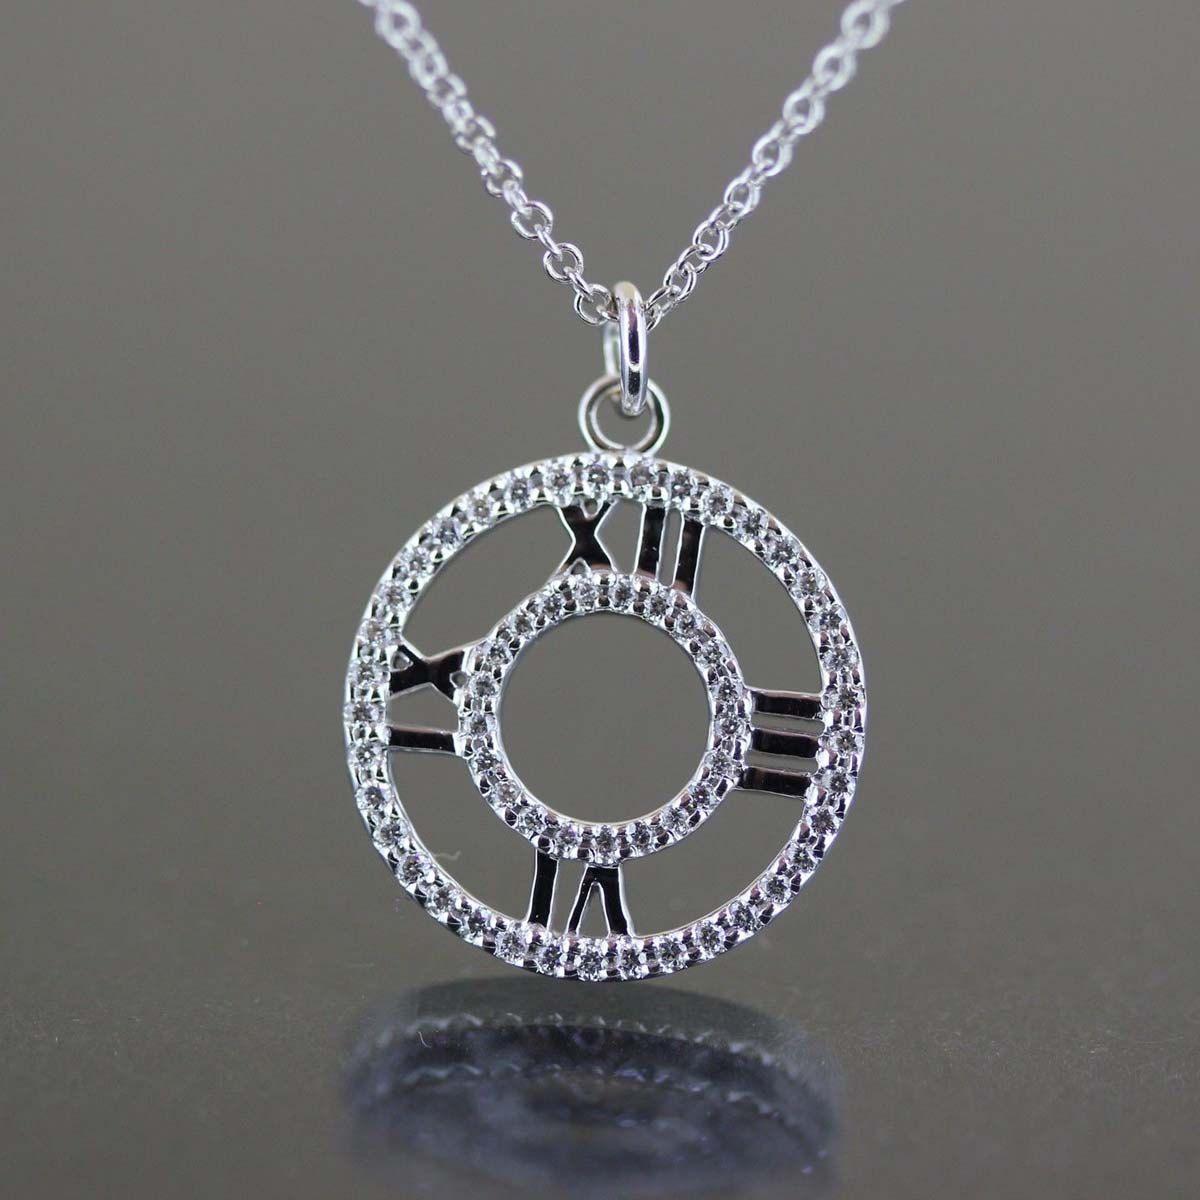 327b5e2cb Authentic Tiffany & Co Designer 18k White Gold Atlas Diamond Necklace by  crystalanchor on Etsy